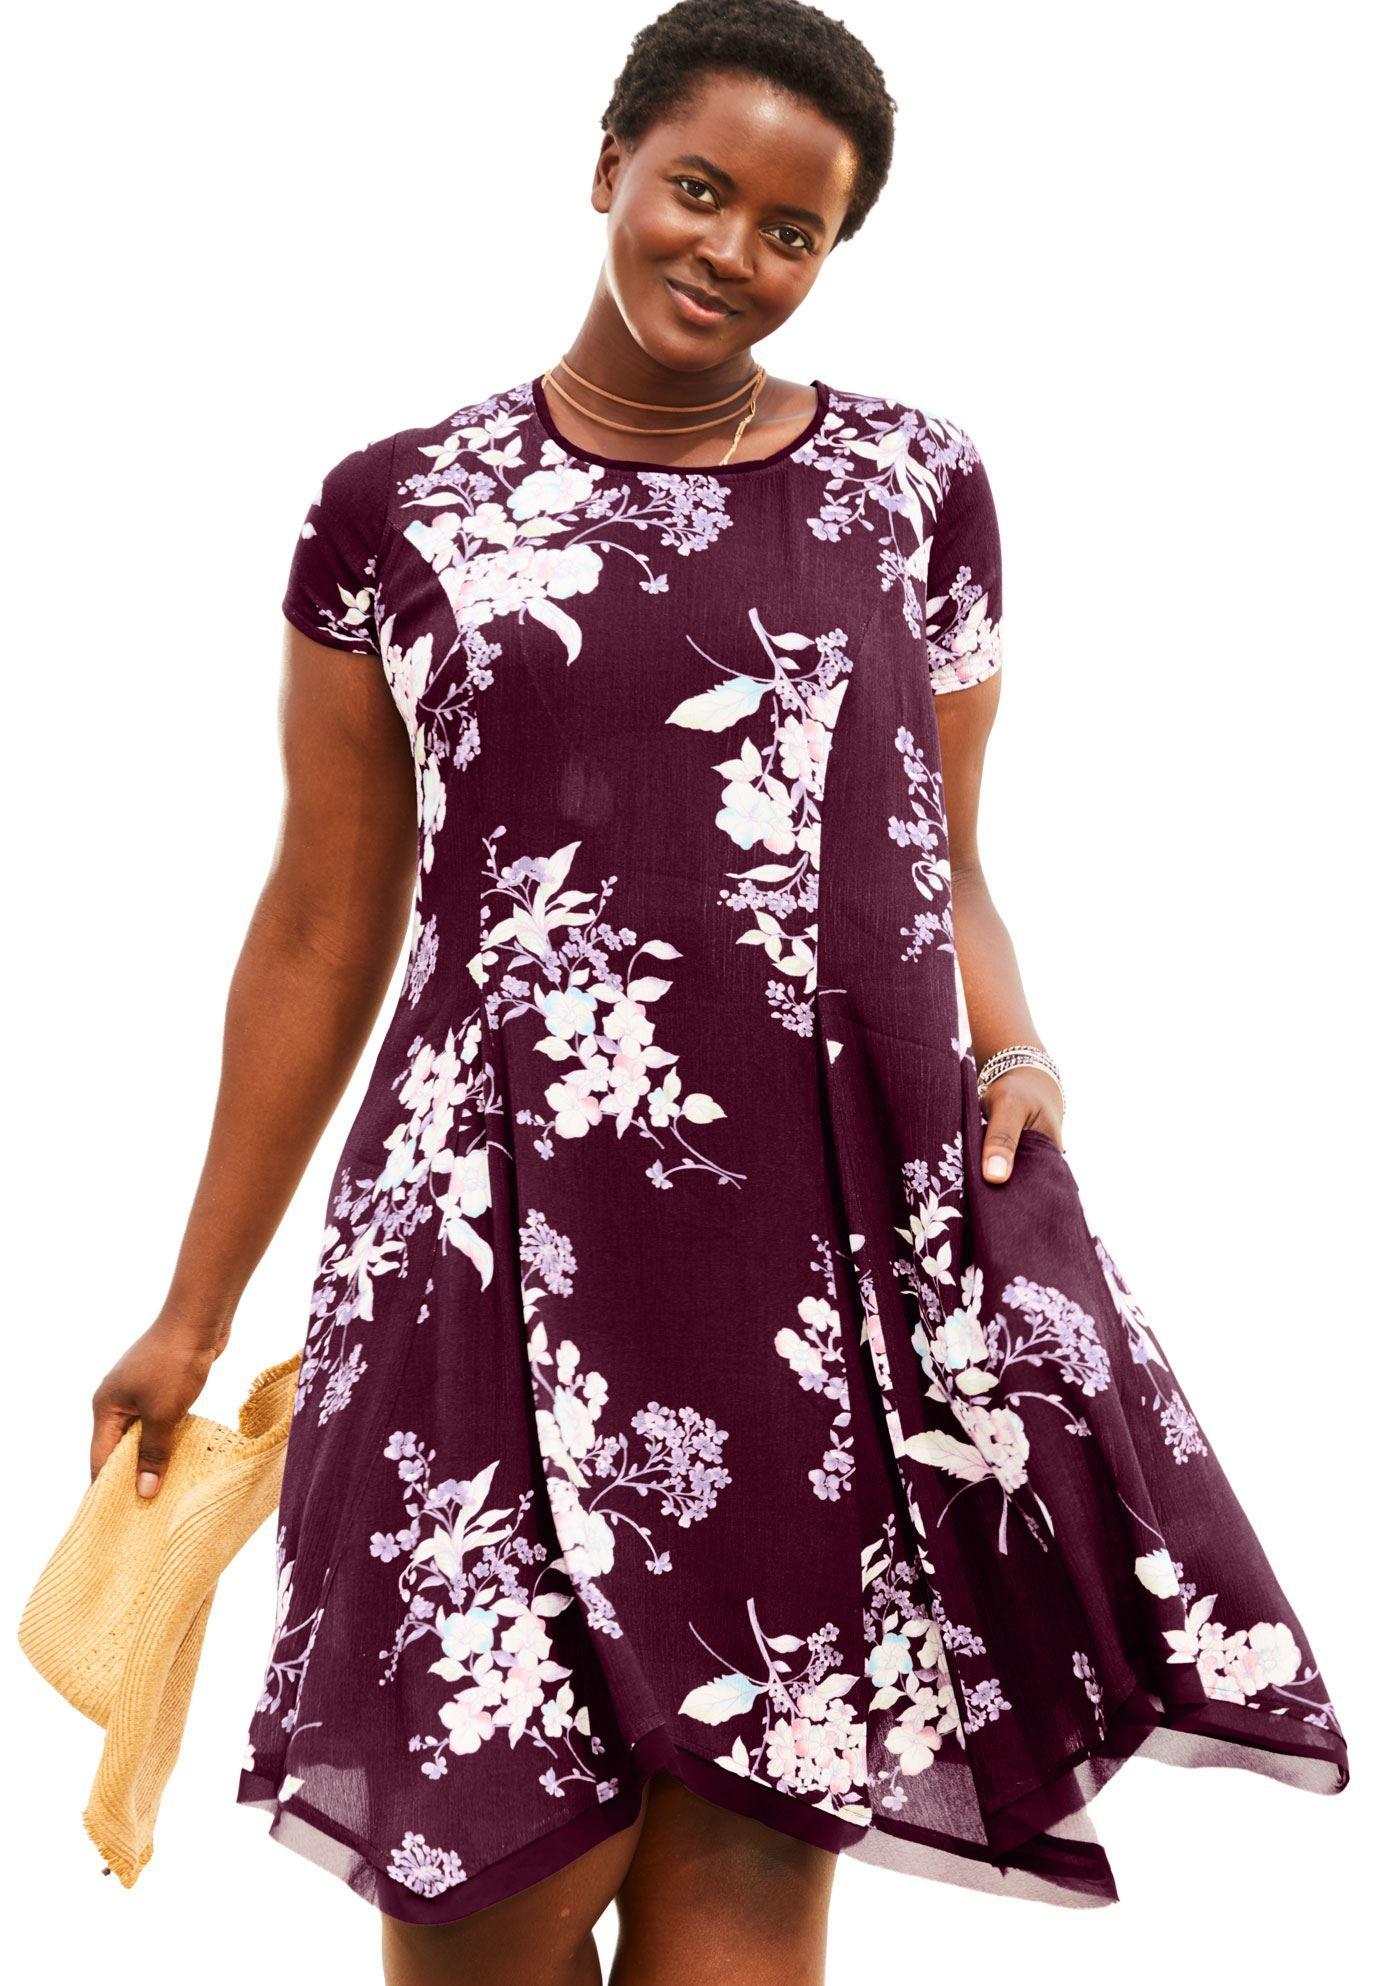 342325cb1f Short Crepe Dress - Women s Plus Size Clothing